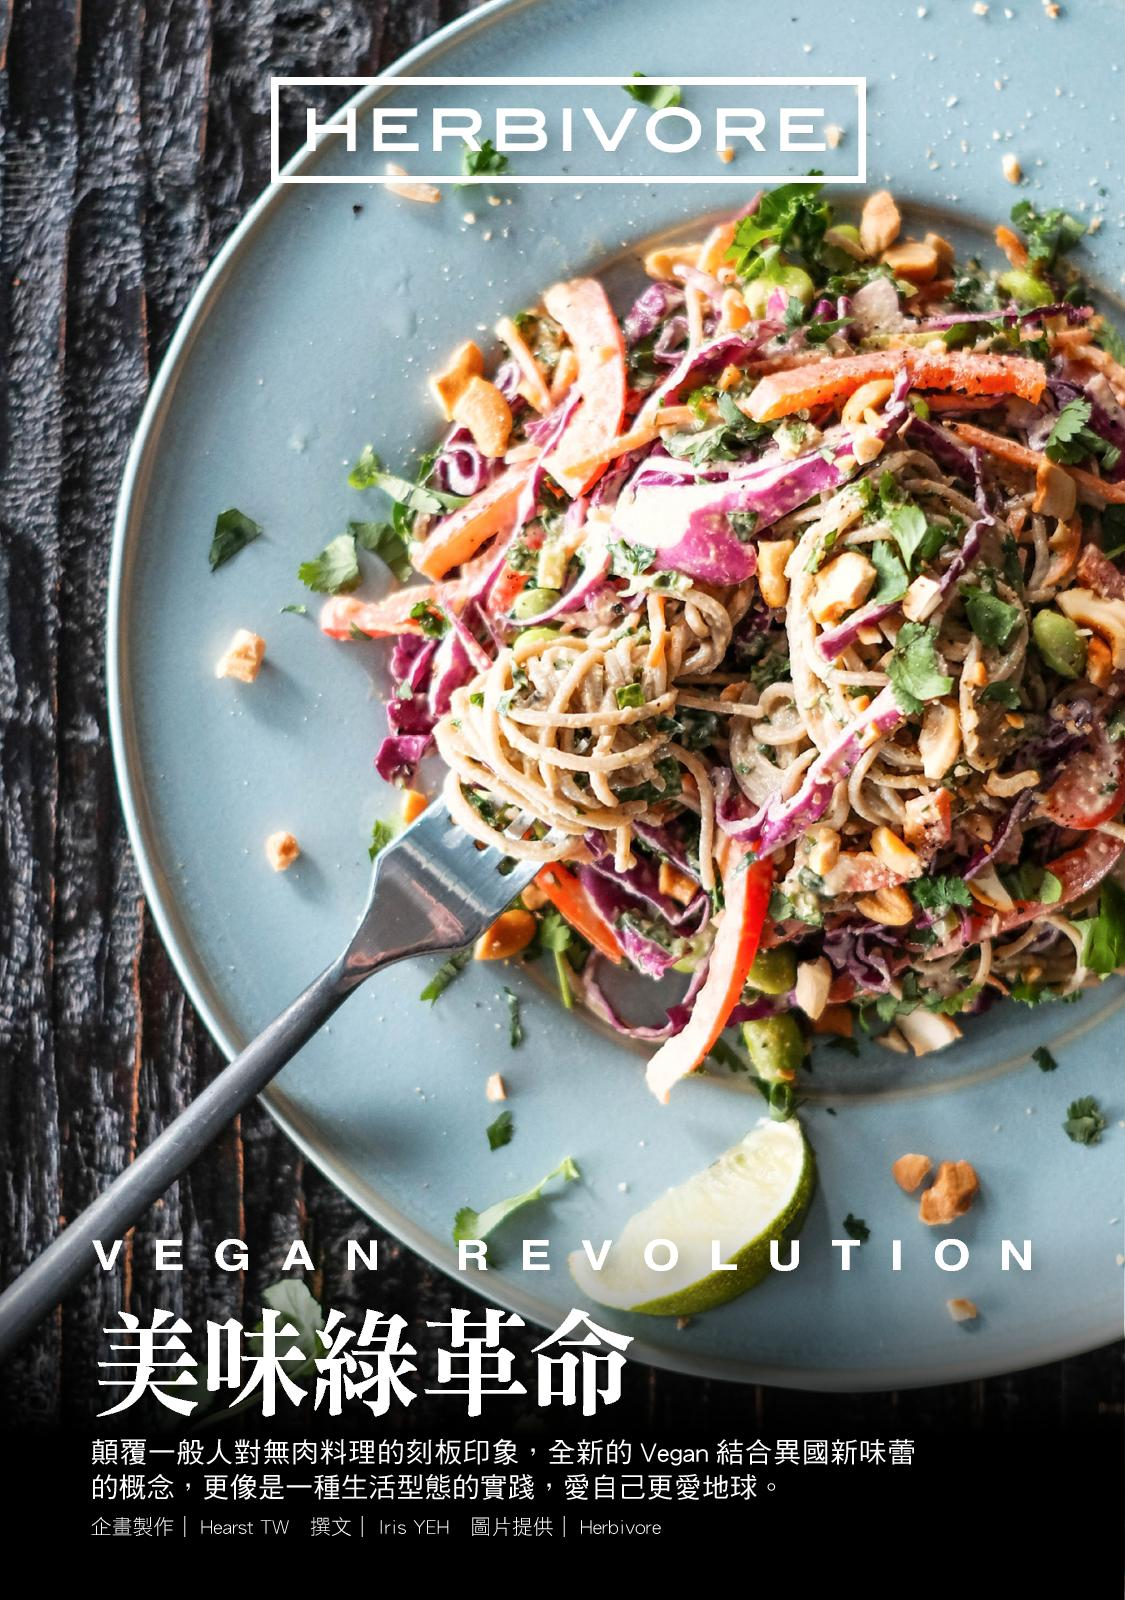 潮流觀點2018 3月 Herbivore 美味綠革命